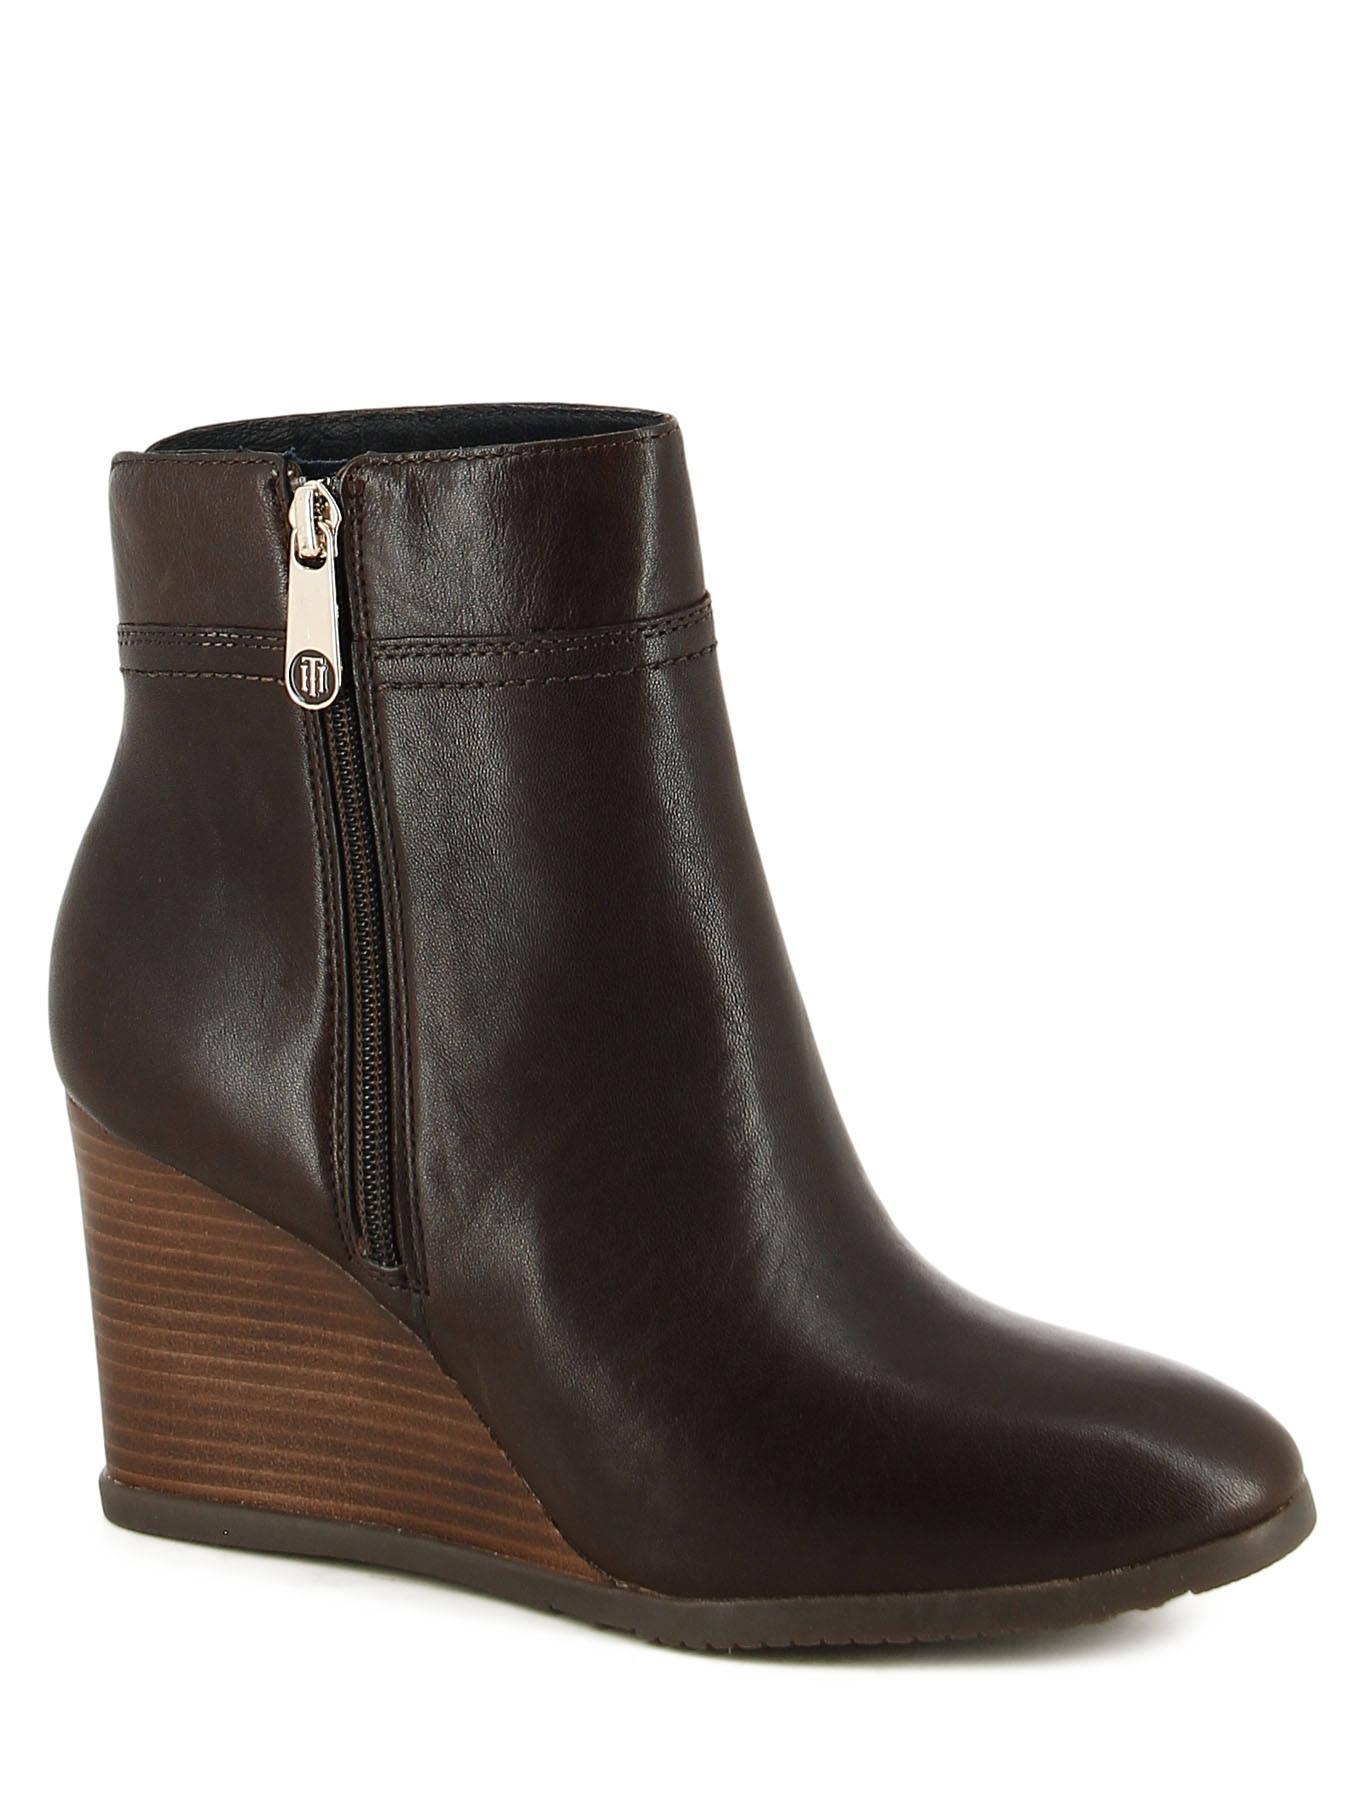 boots bottines tommy hilfiger boots bottines coffee en vente au meilleur prix. Black Bedroom Furniture Sets. Home Design Ideas